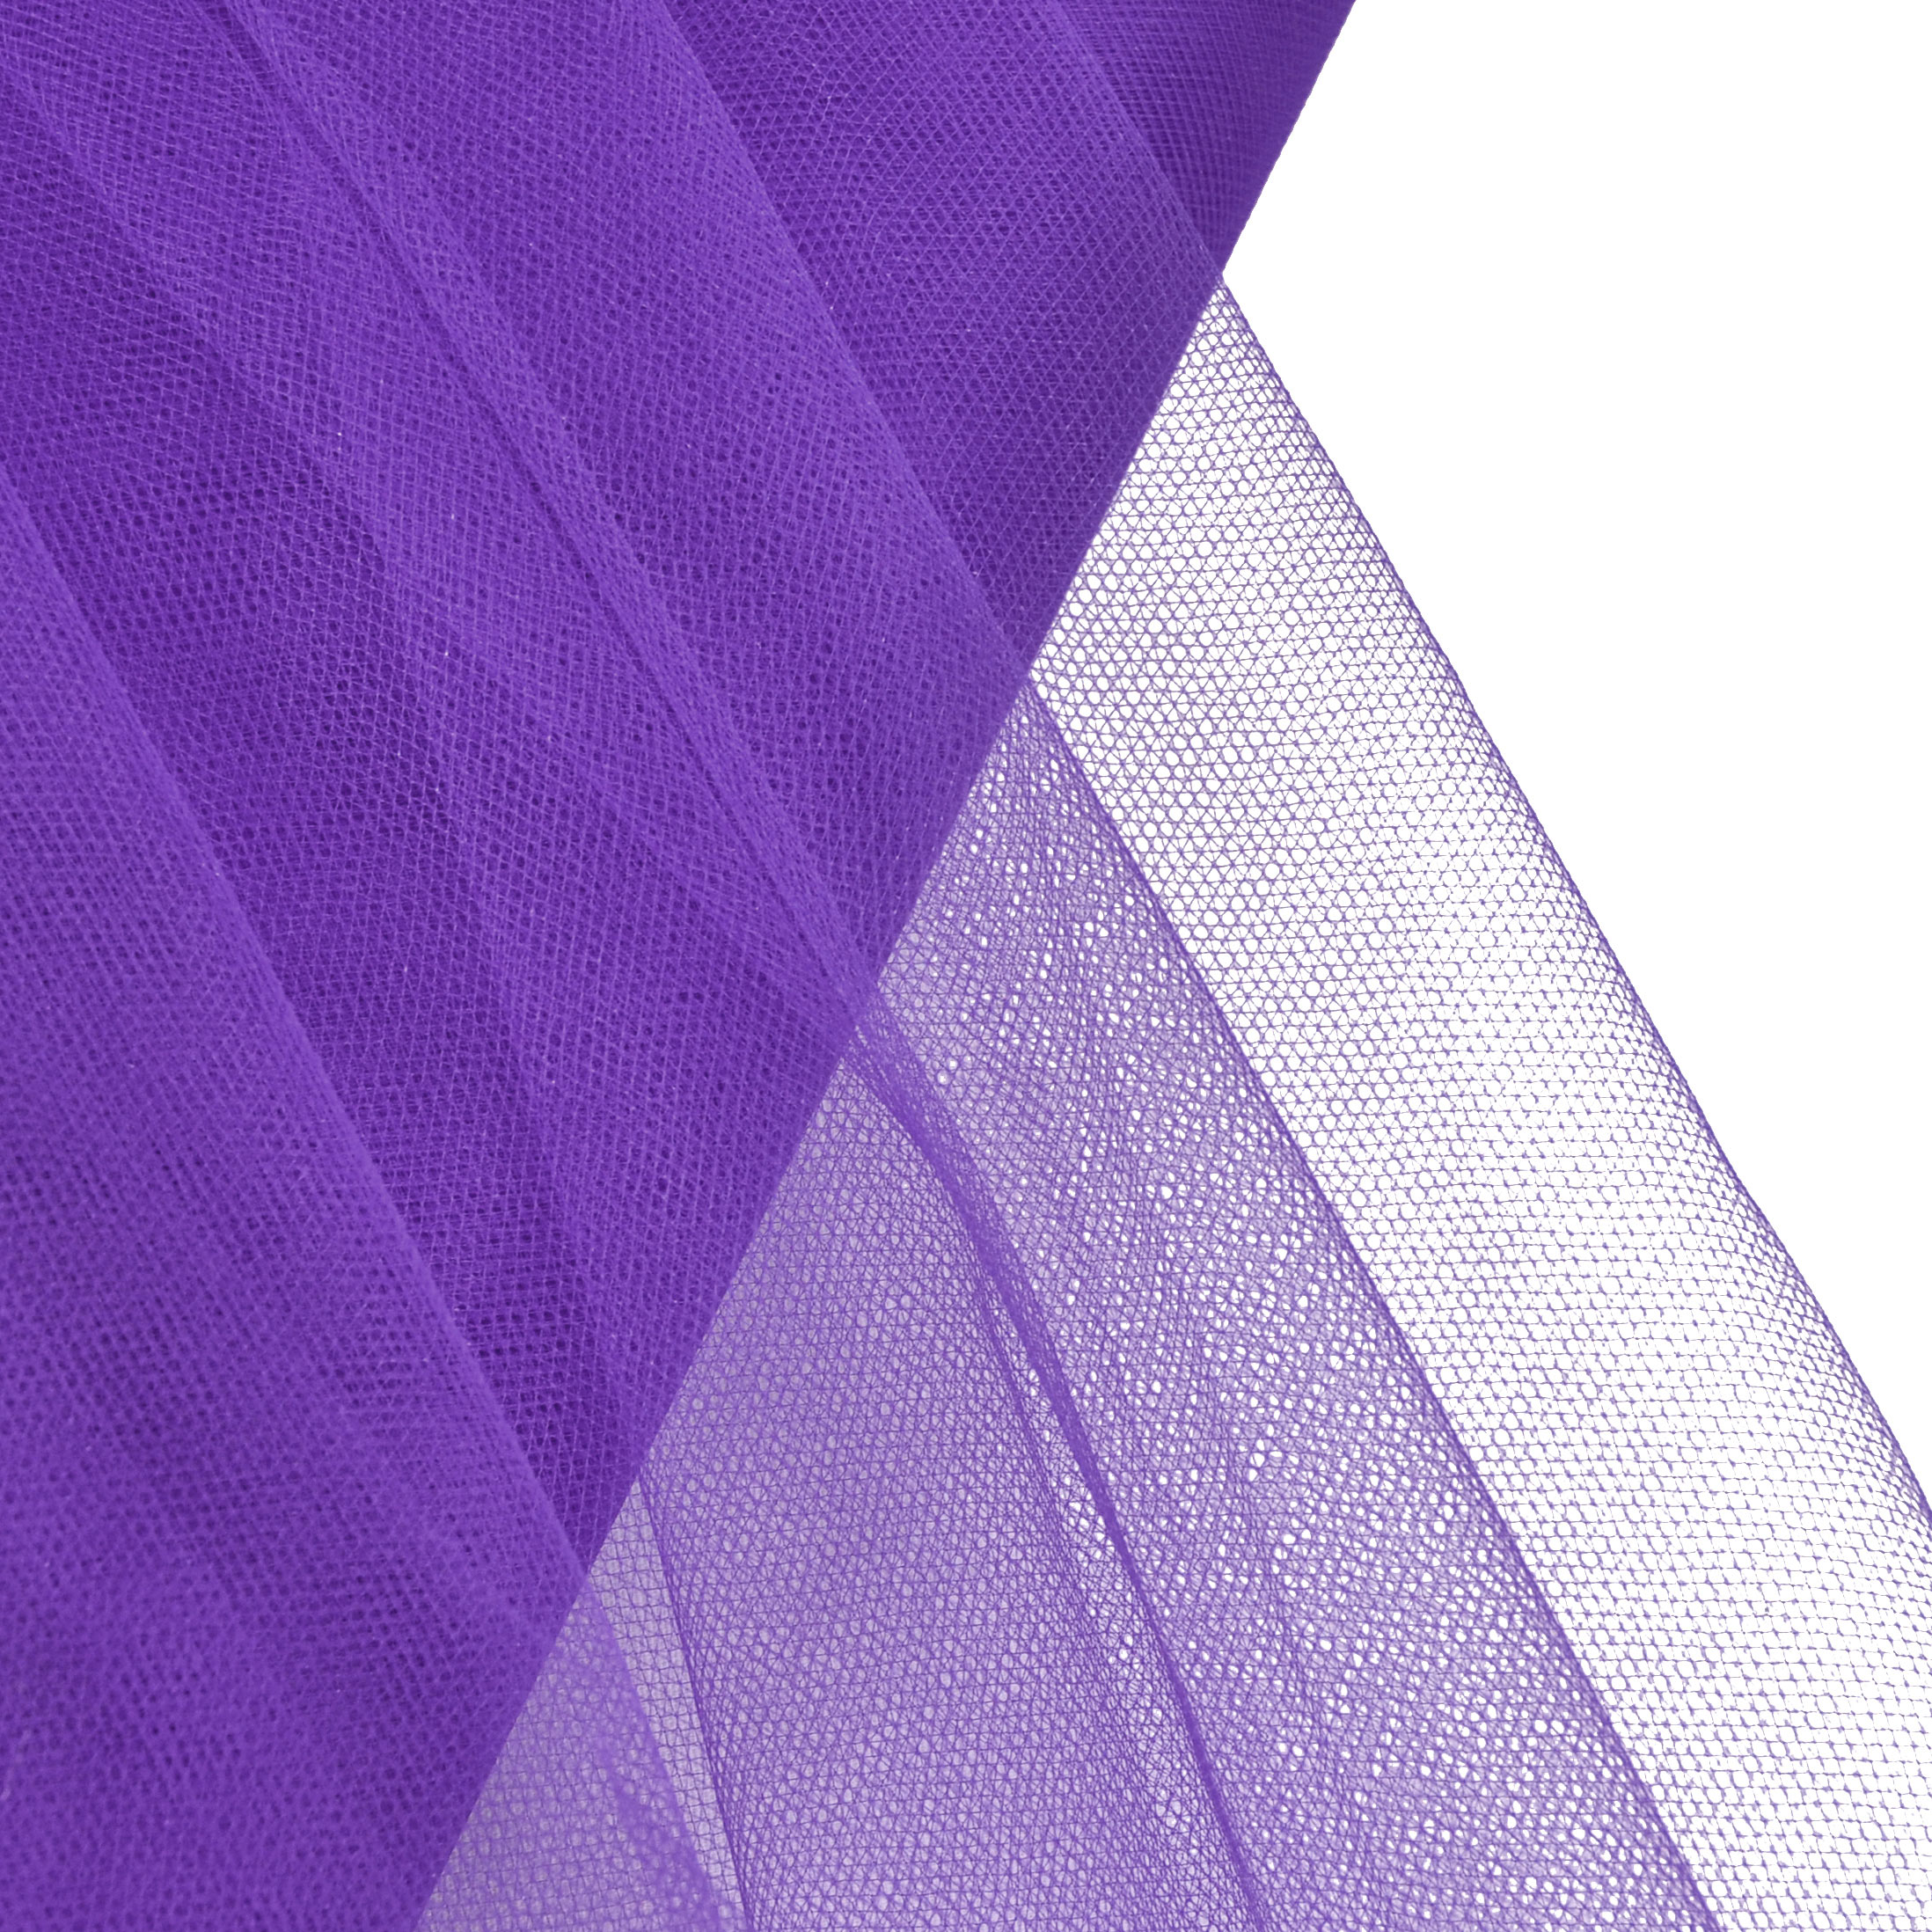 Great Green Tulle Fabric 2196 x 2196 · 1122 kB · jpeg